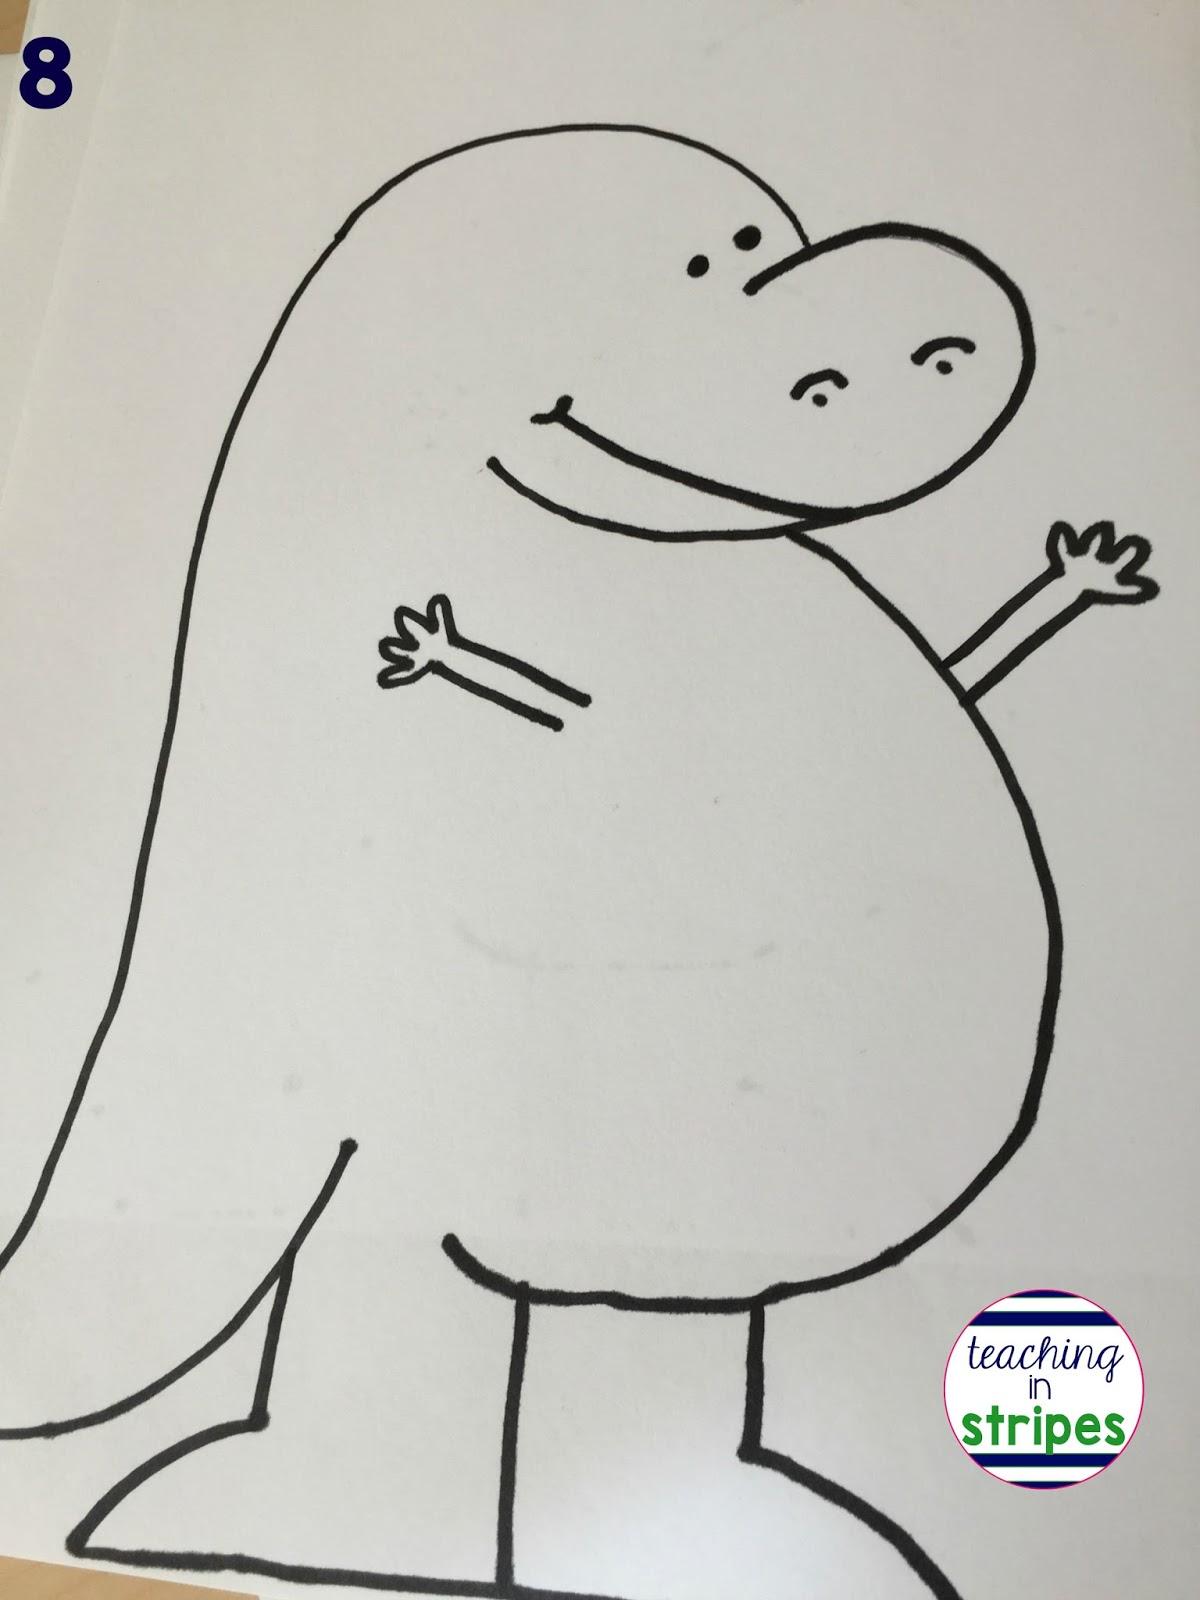 dav pilkey dragon coloring pages - photo#7